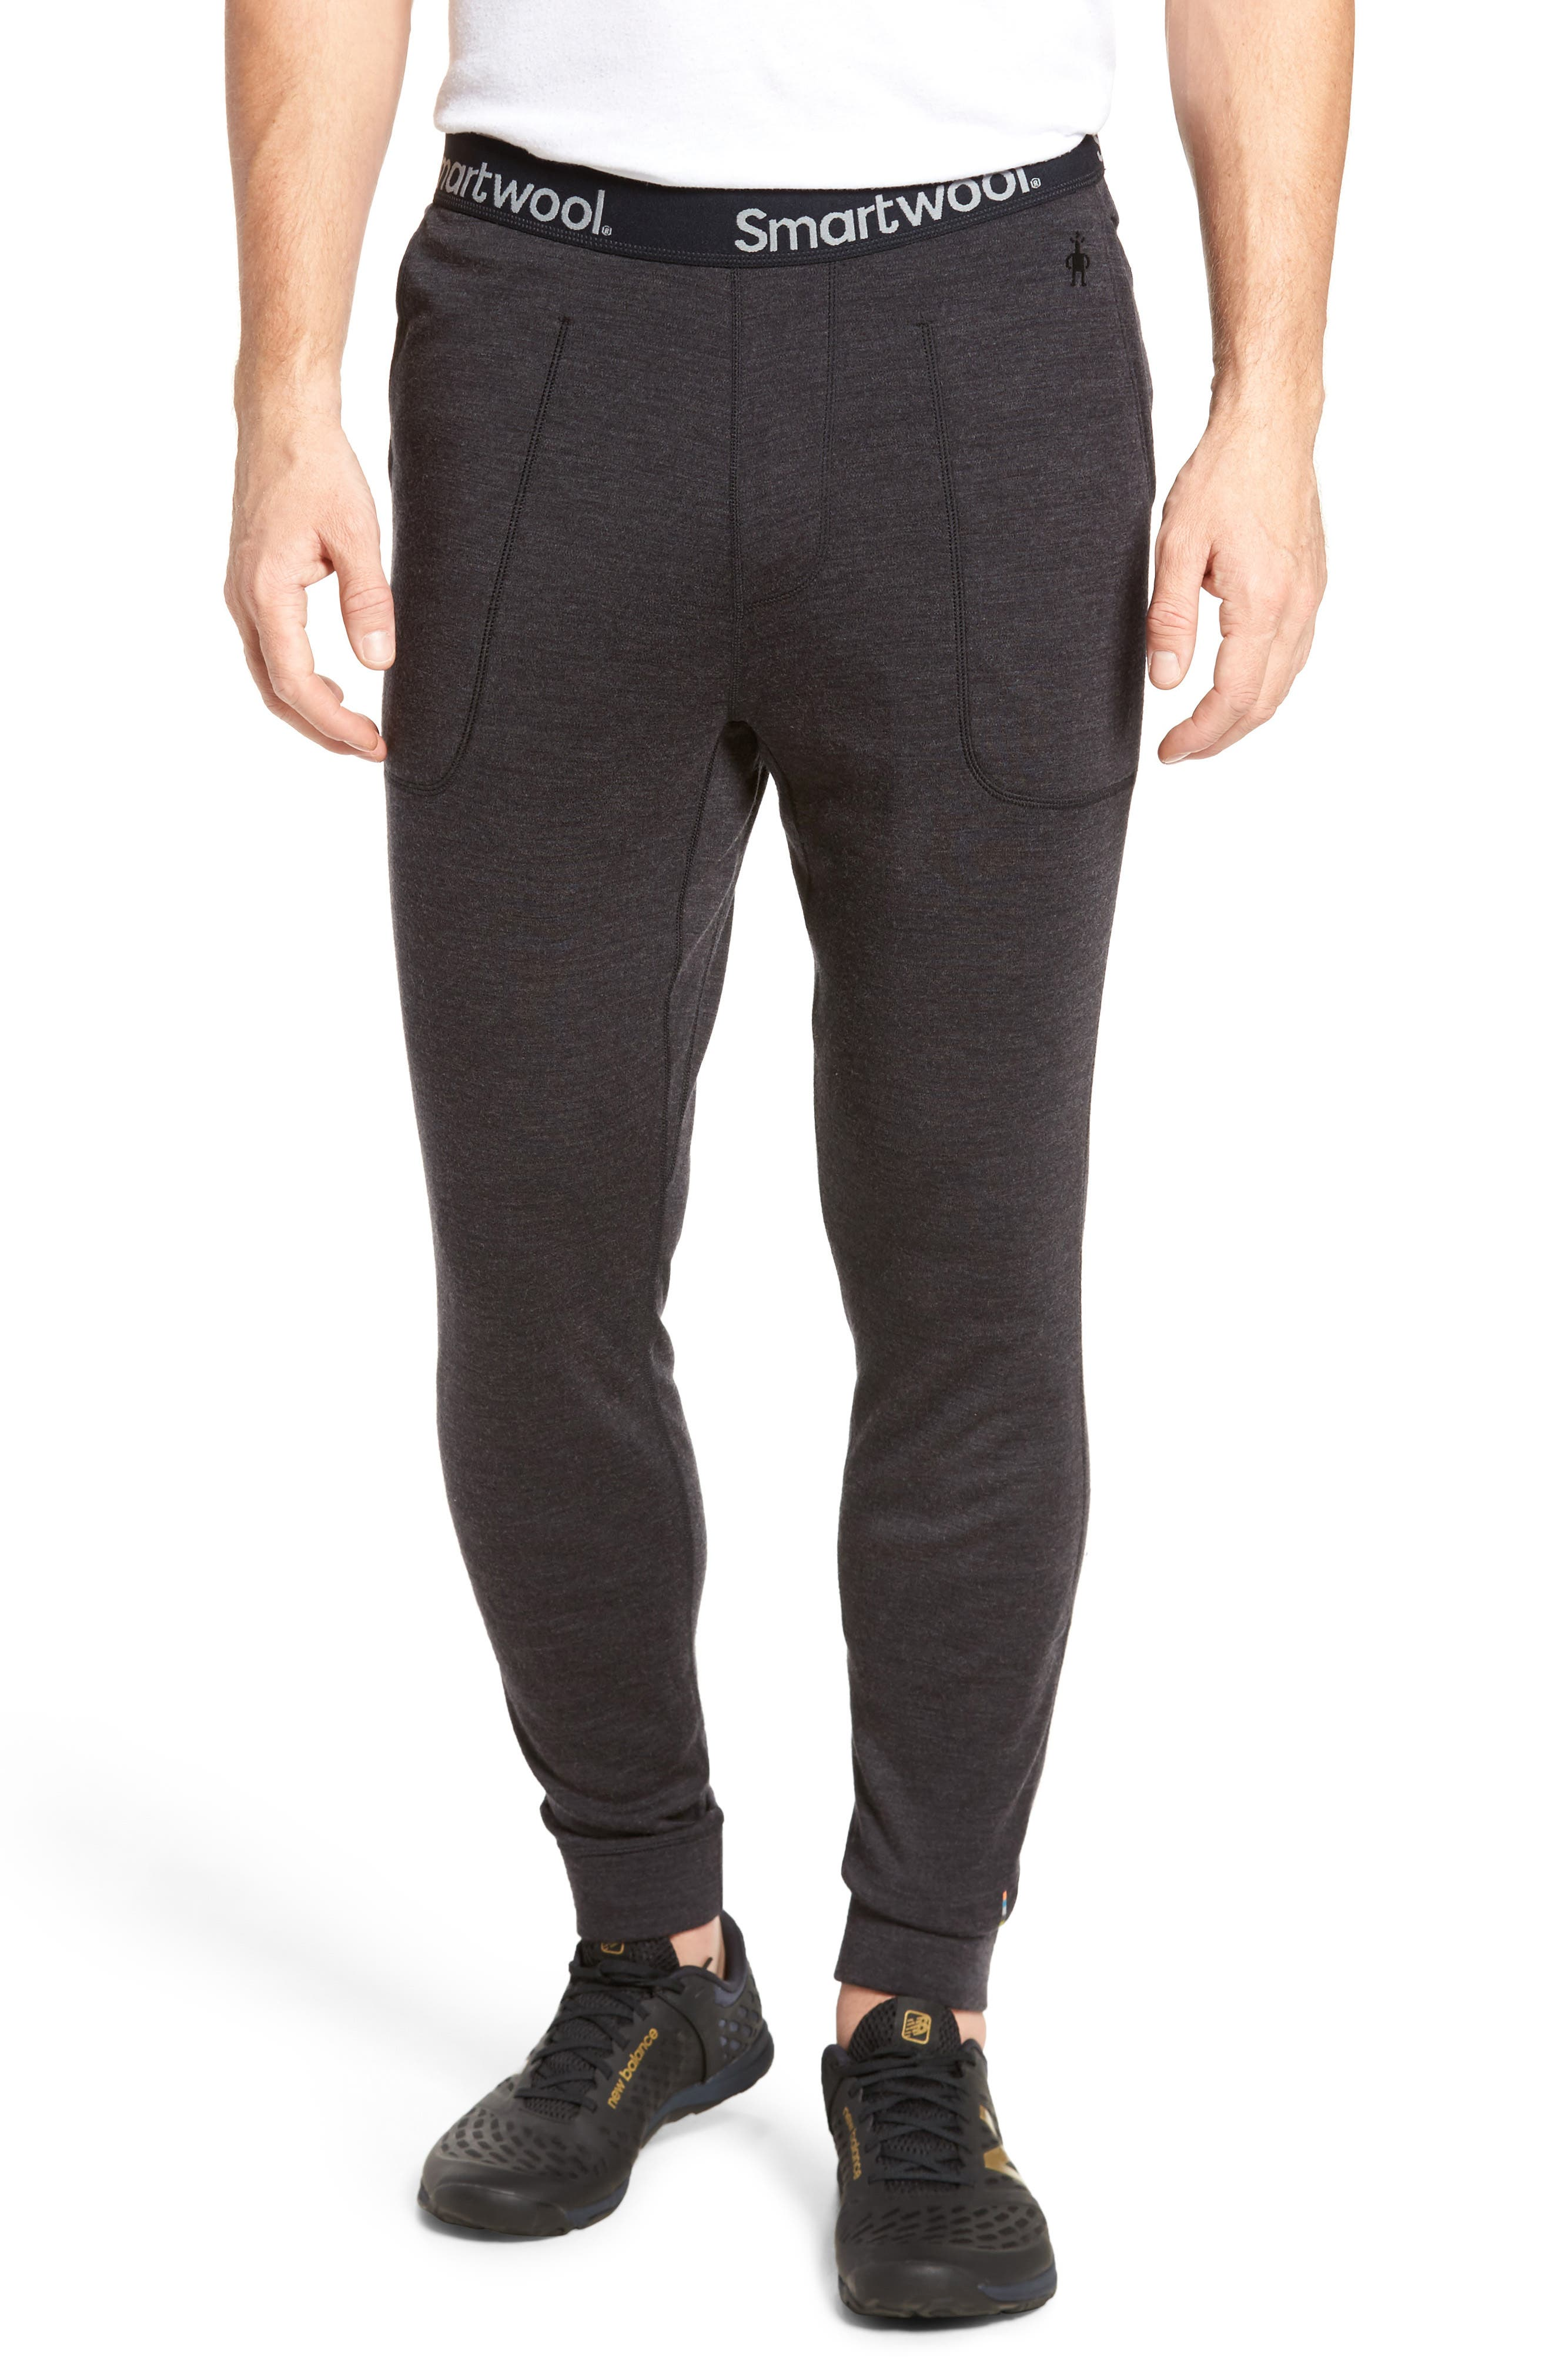 Men's Smartwool 250 Merino Wool Jogger Pants